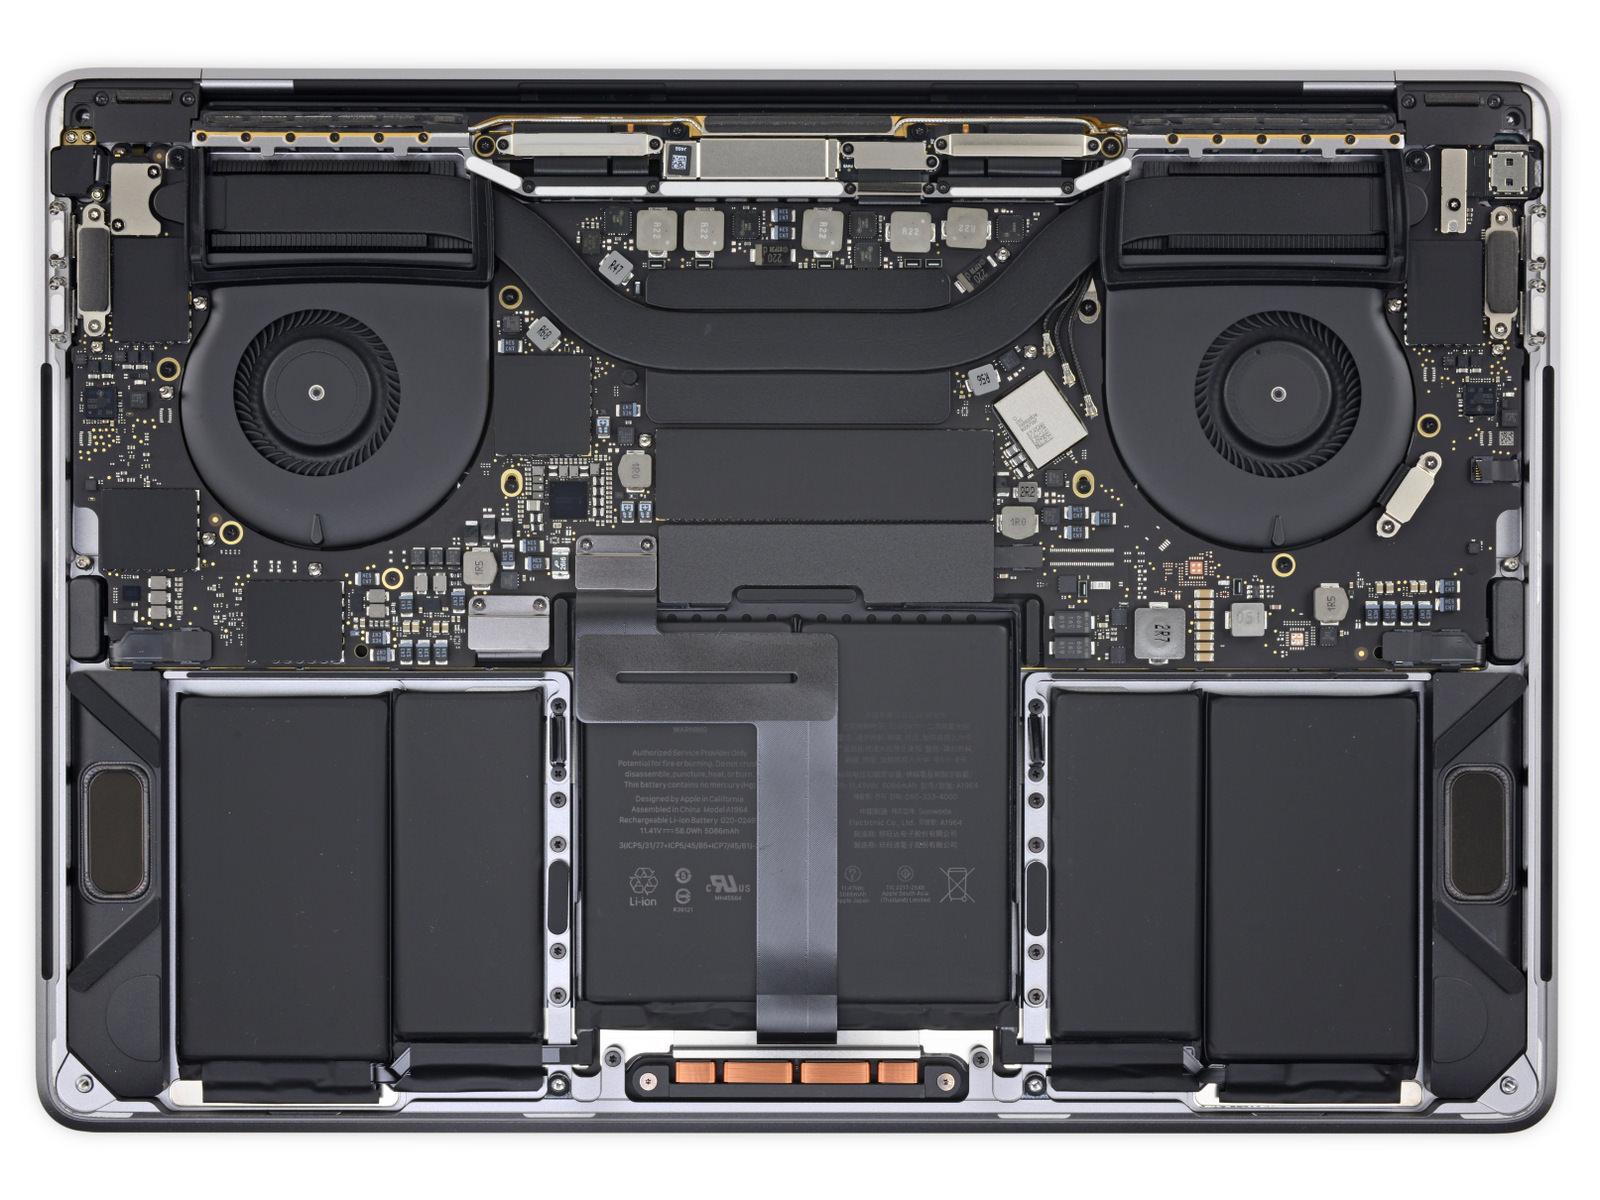 MacBook Pro(2018) iFixit inside